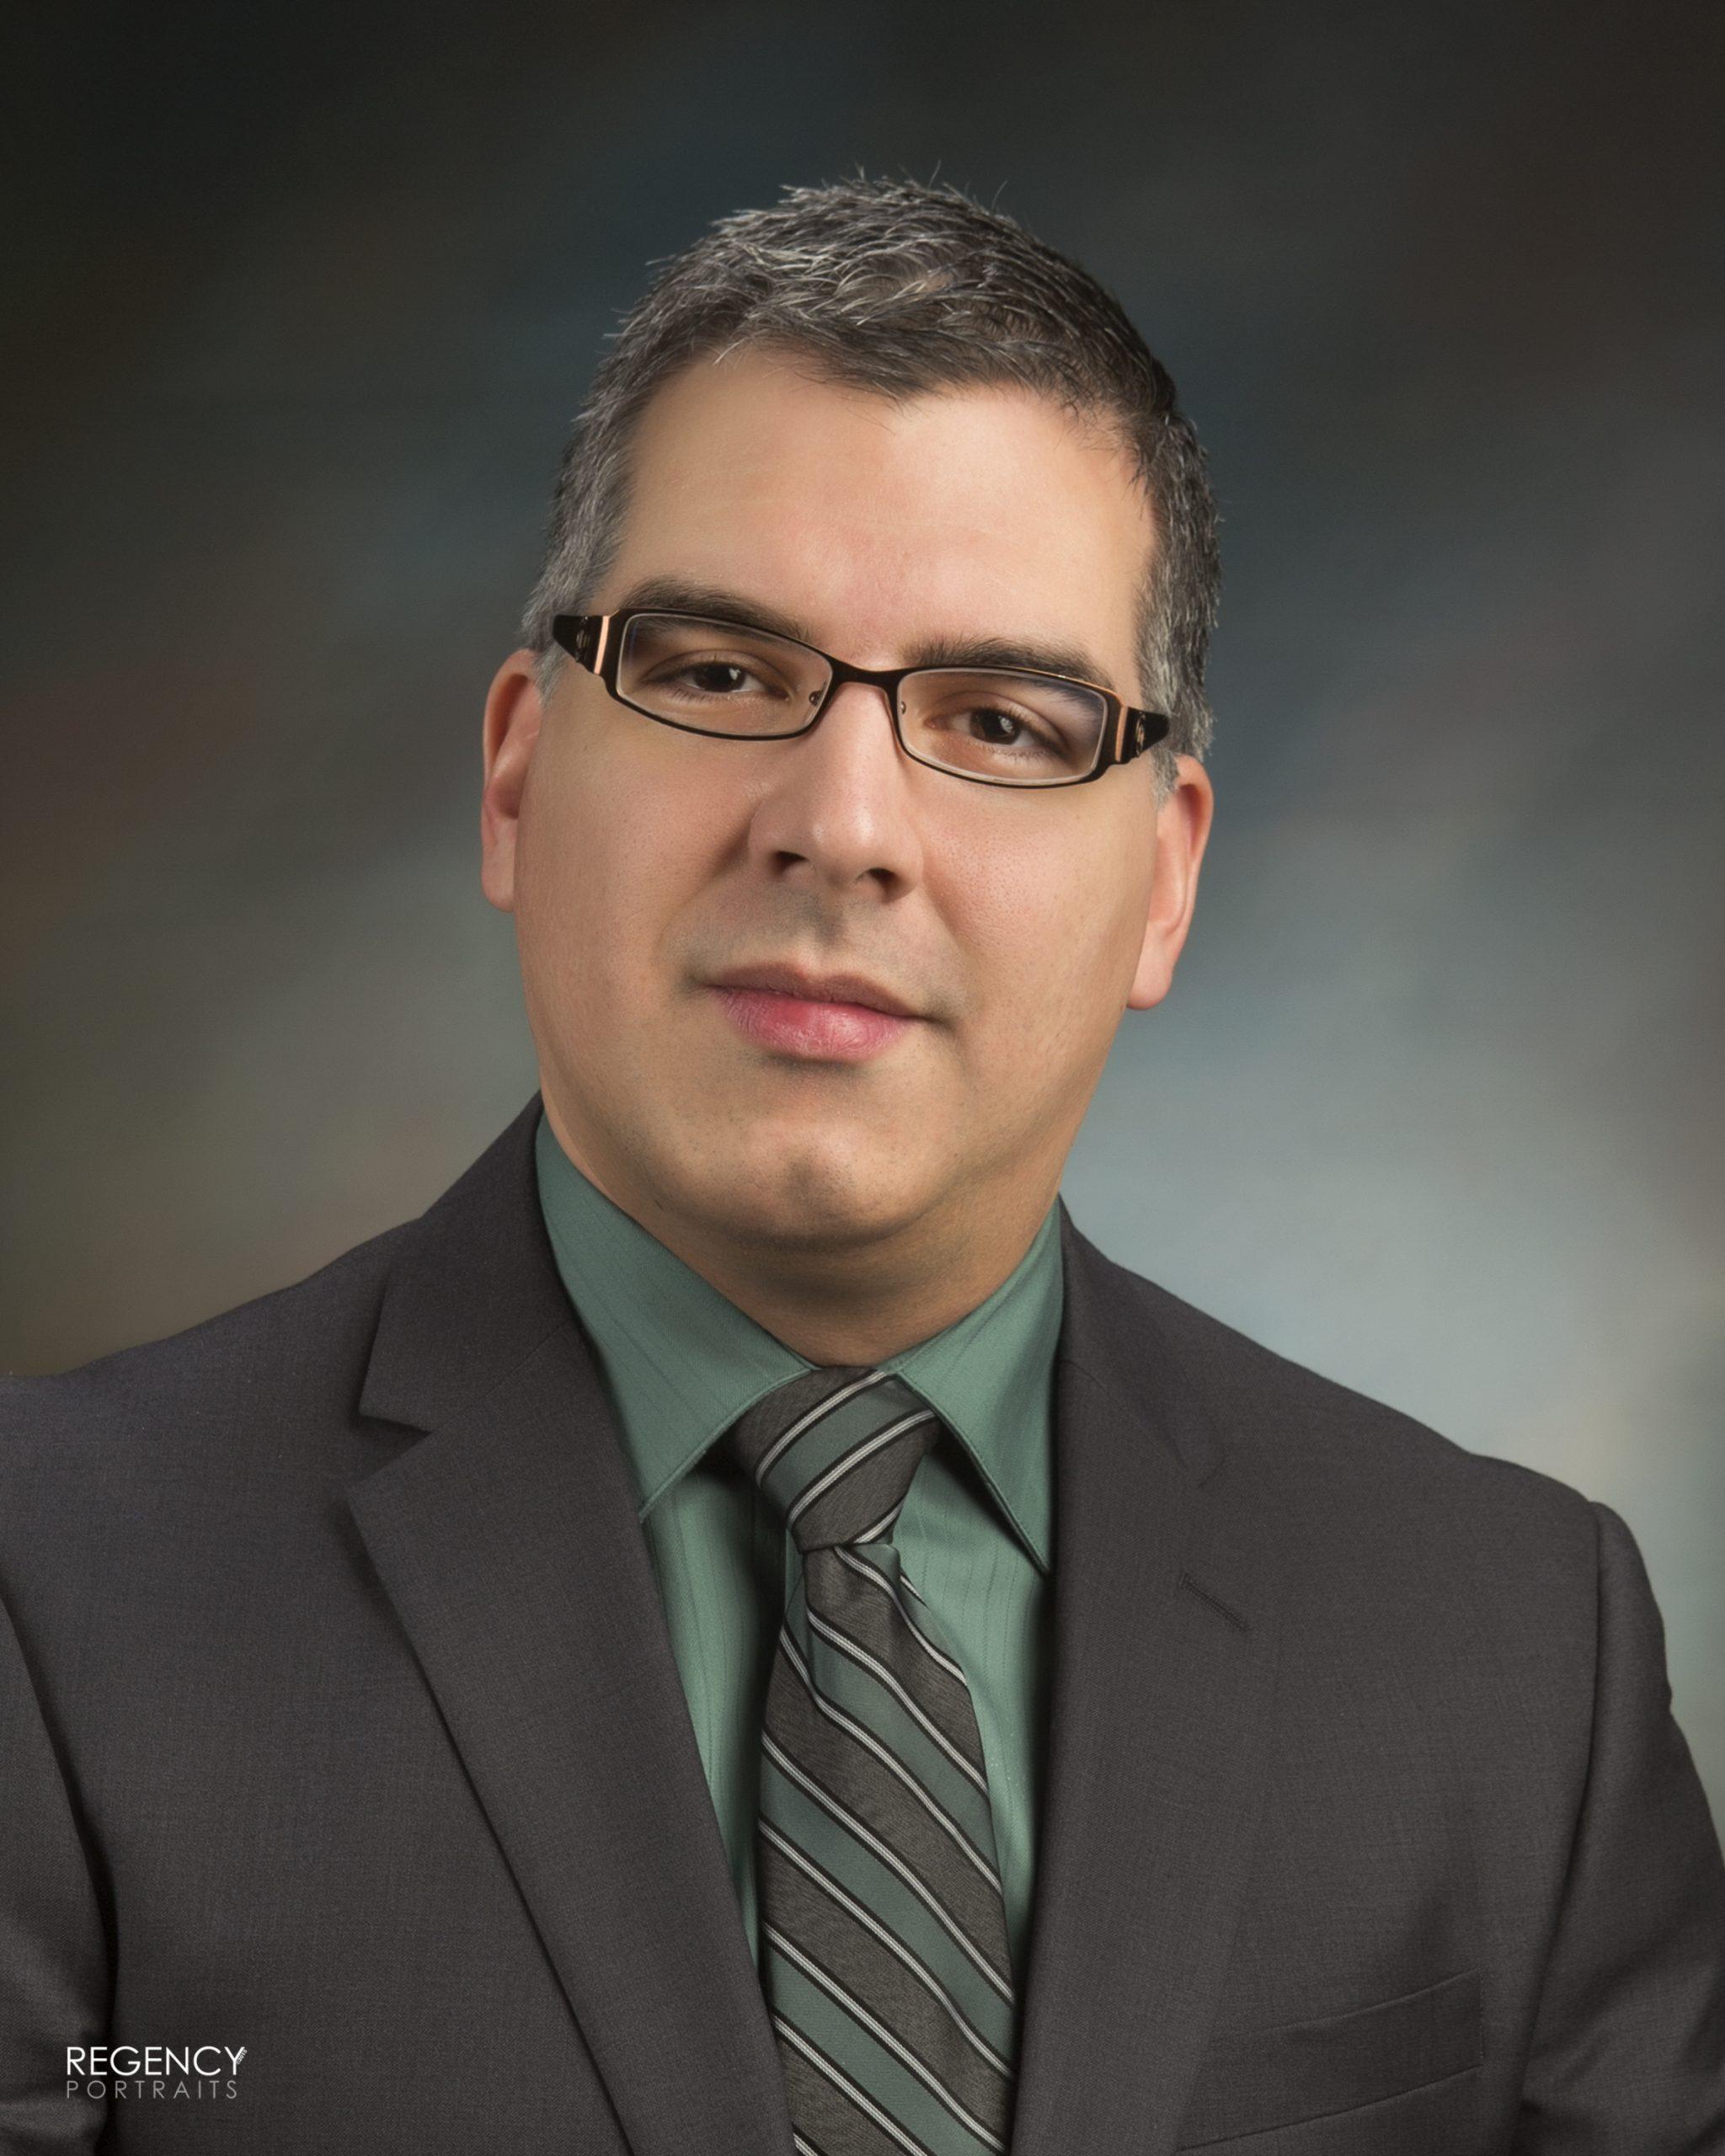 Juan Sandoval